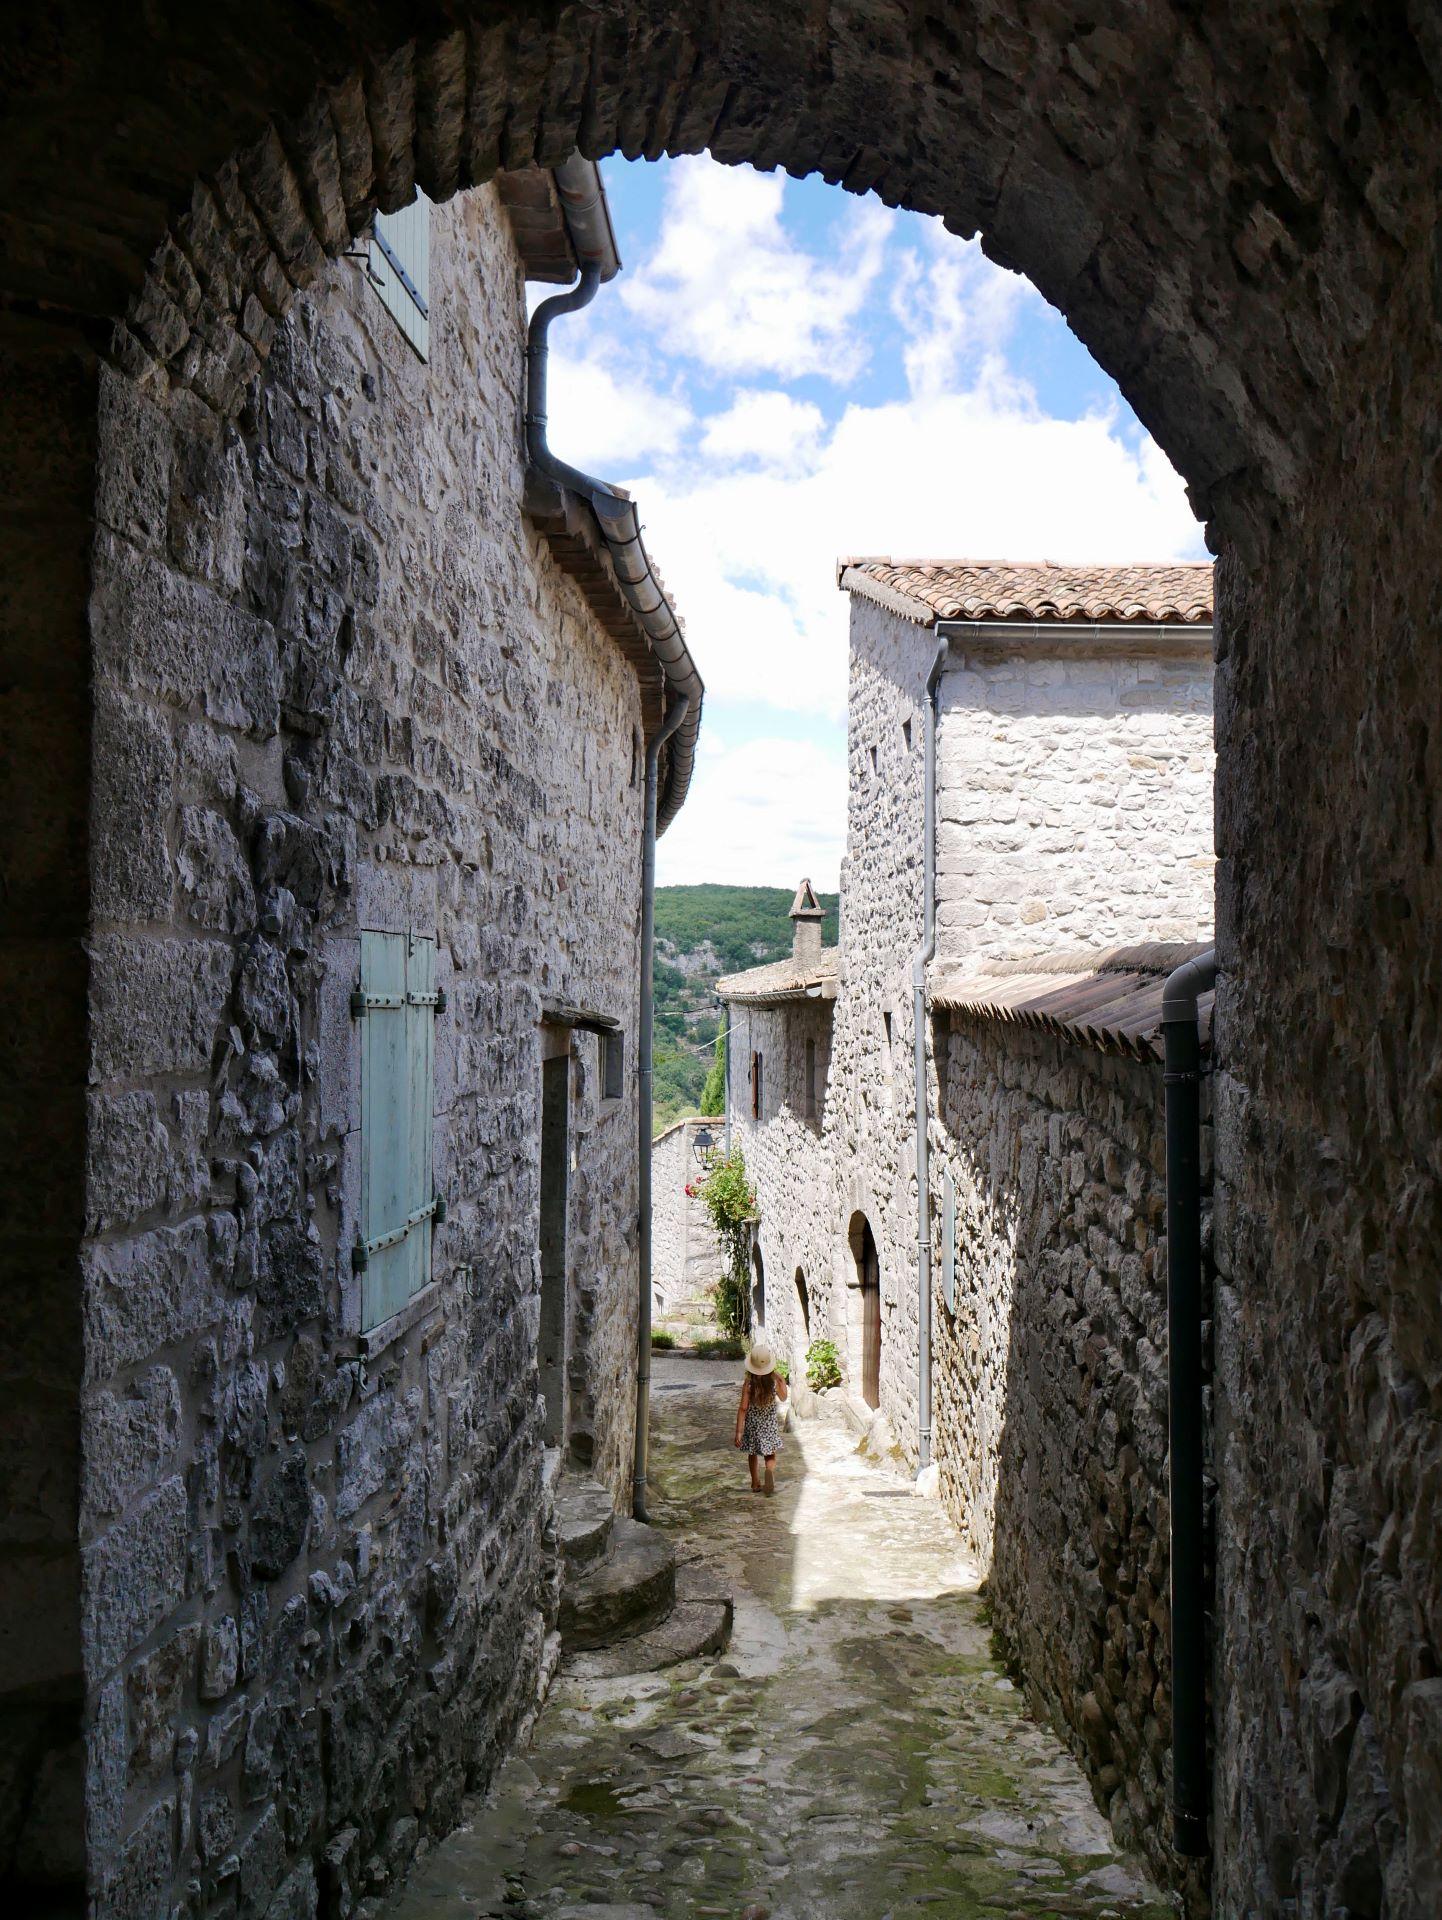 balade en Ardèche : Balazuc, balade dans les ruelles